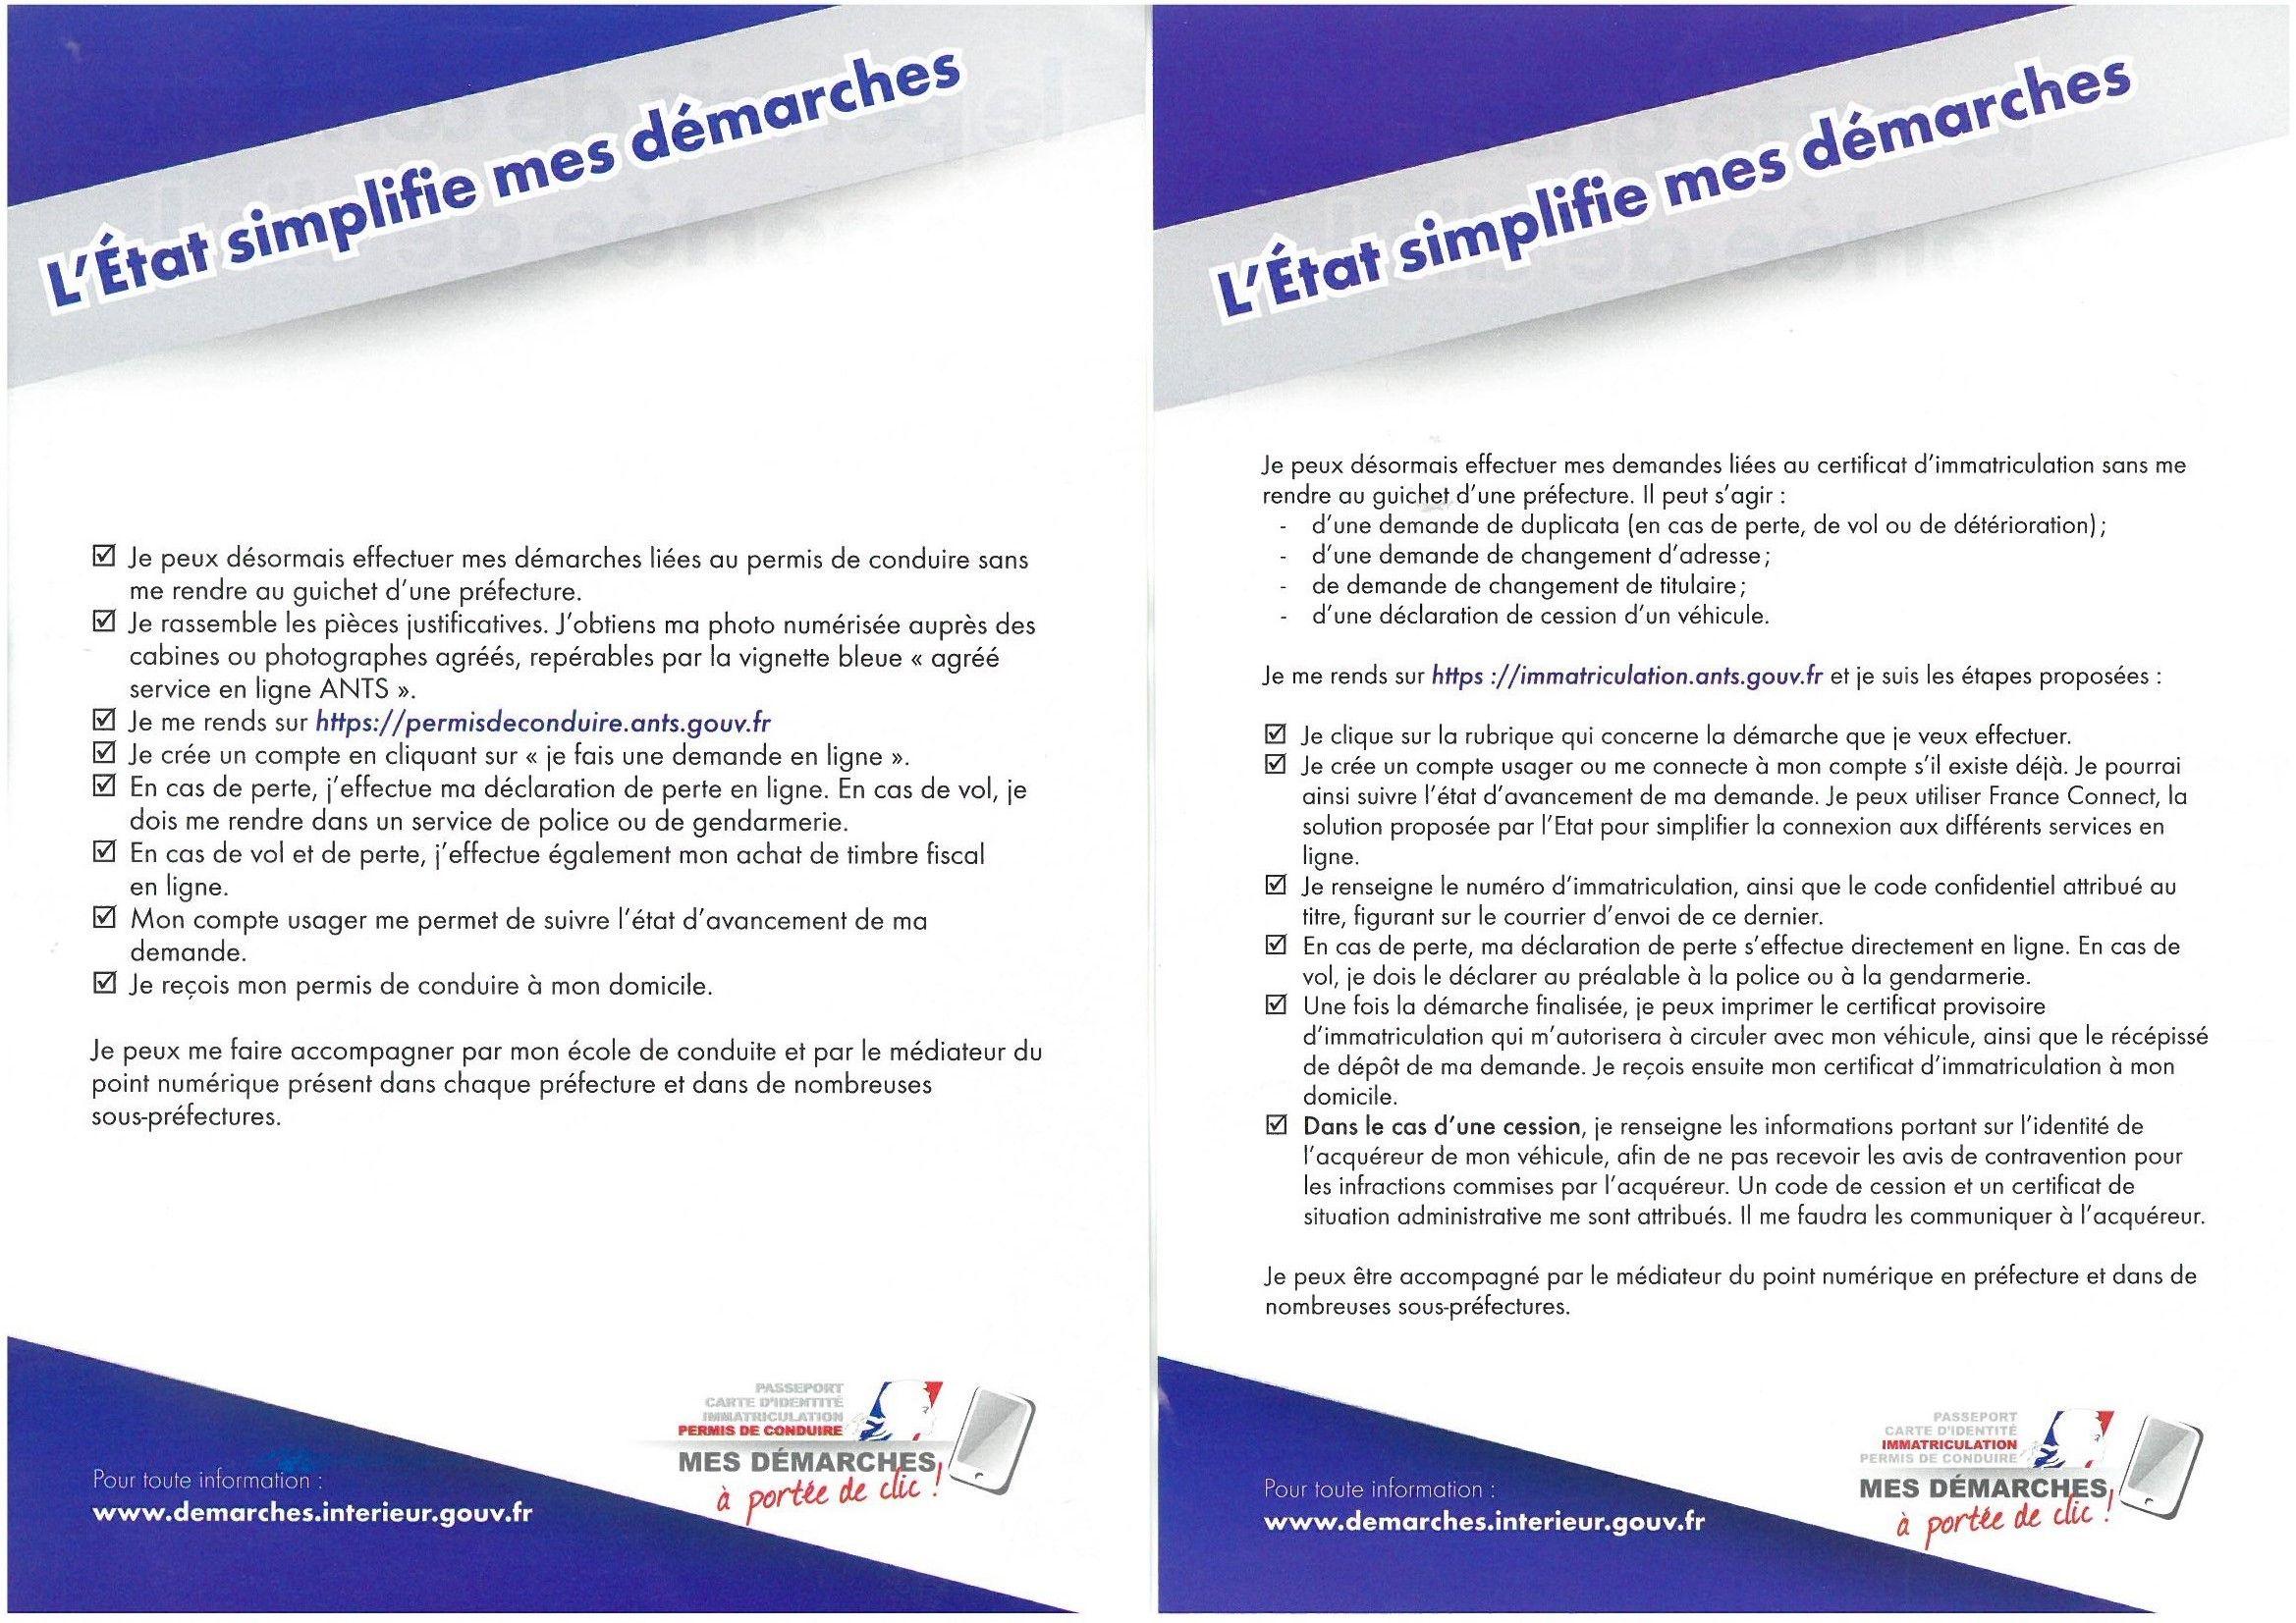 http://www.saintdenisdelhotel.fr/medias/sites/3/2017/10/permis-de-conduire-carte-grise-verso.jpg